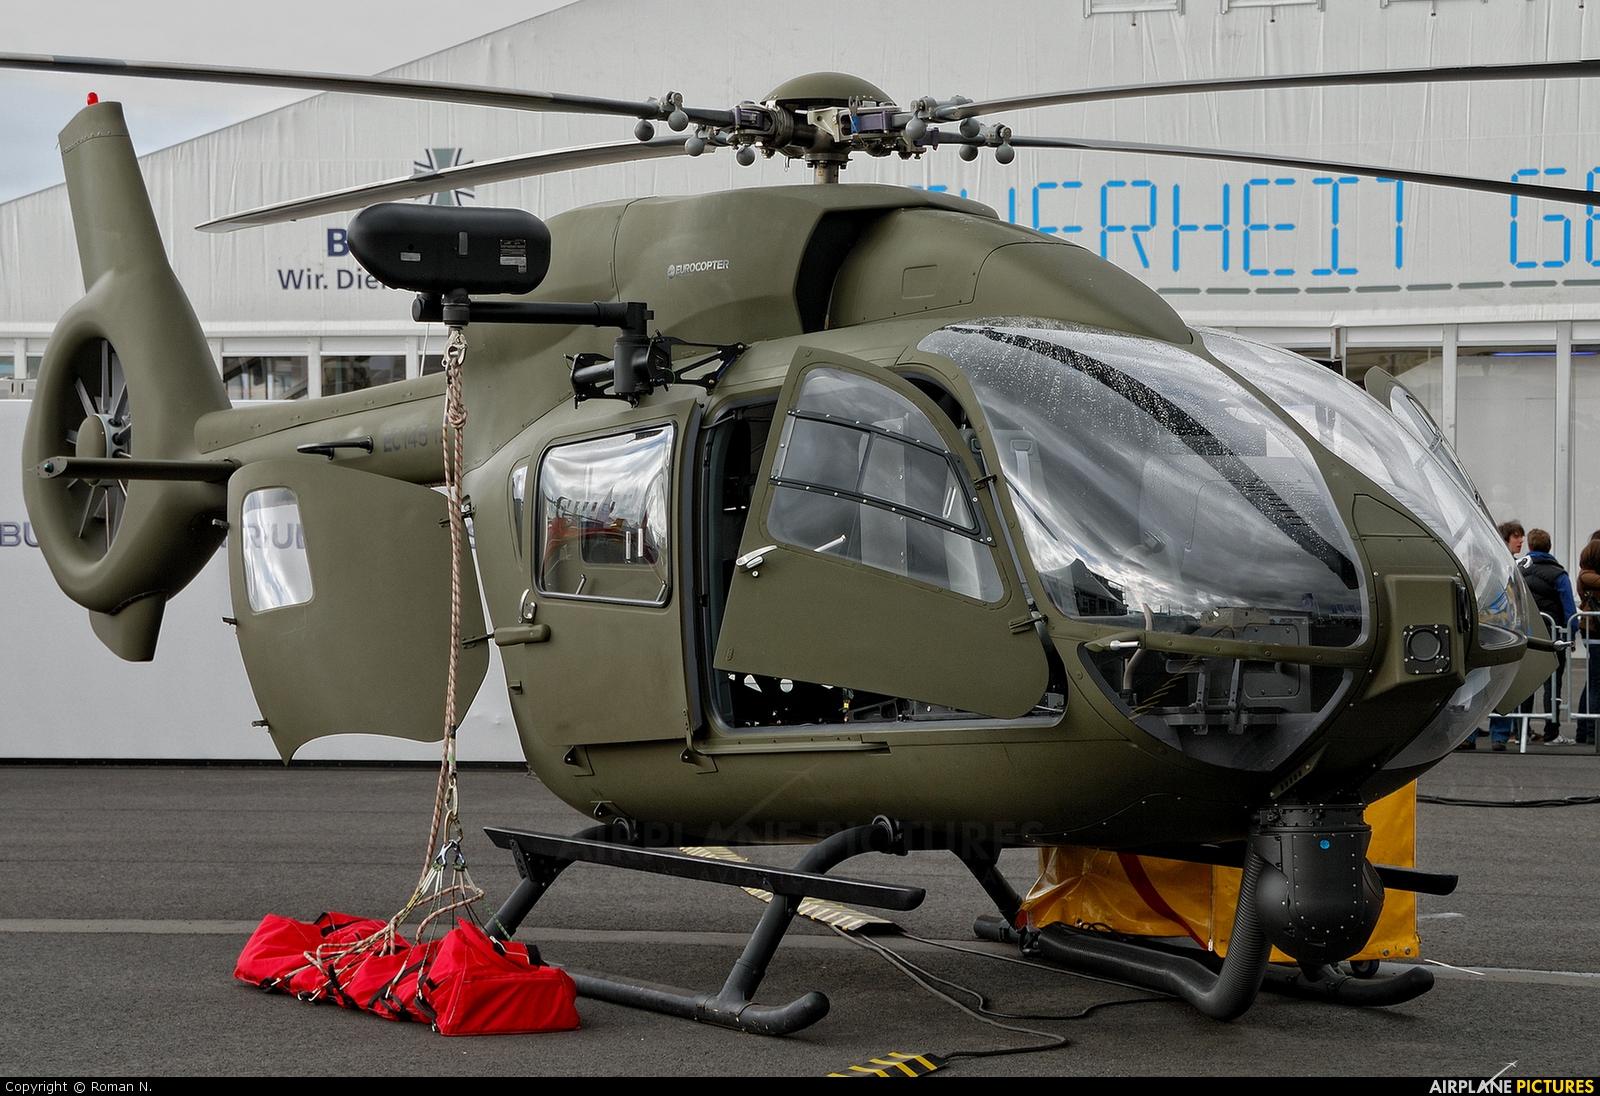 eurocopter eurocopter ec145 at berlin schönefeld photo id 257656